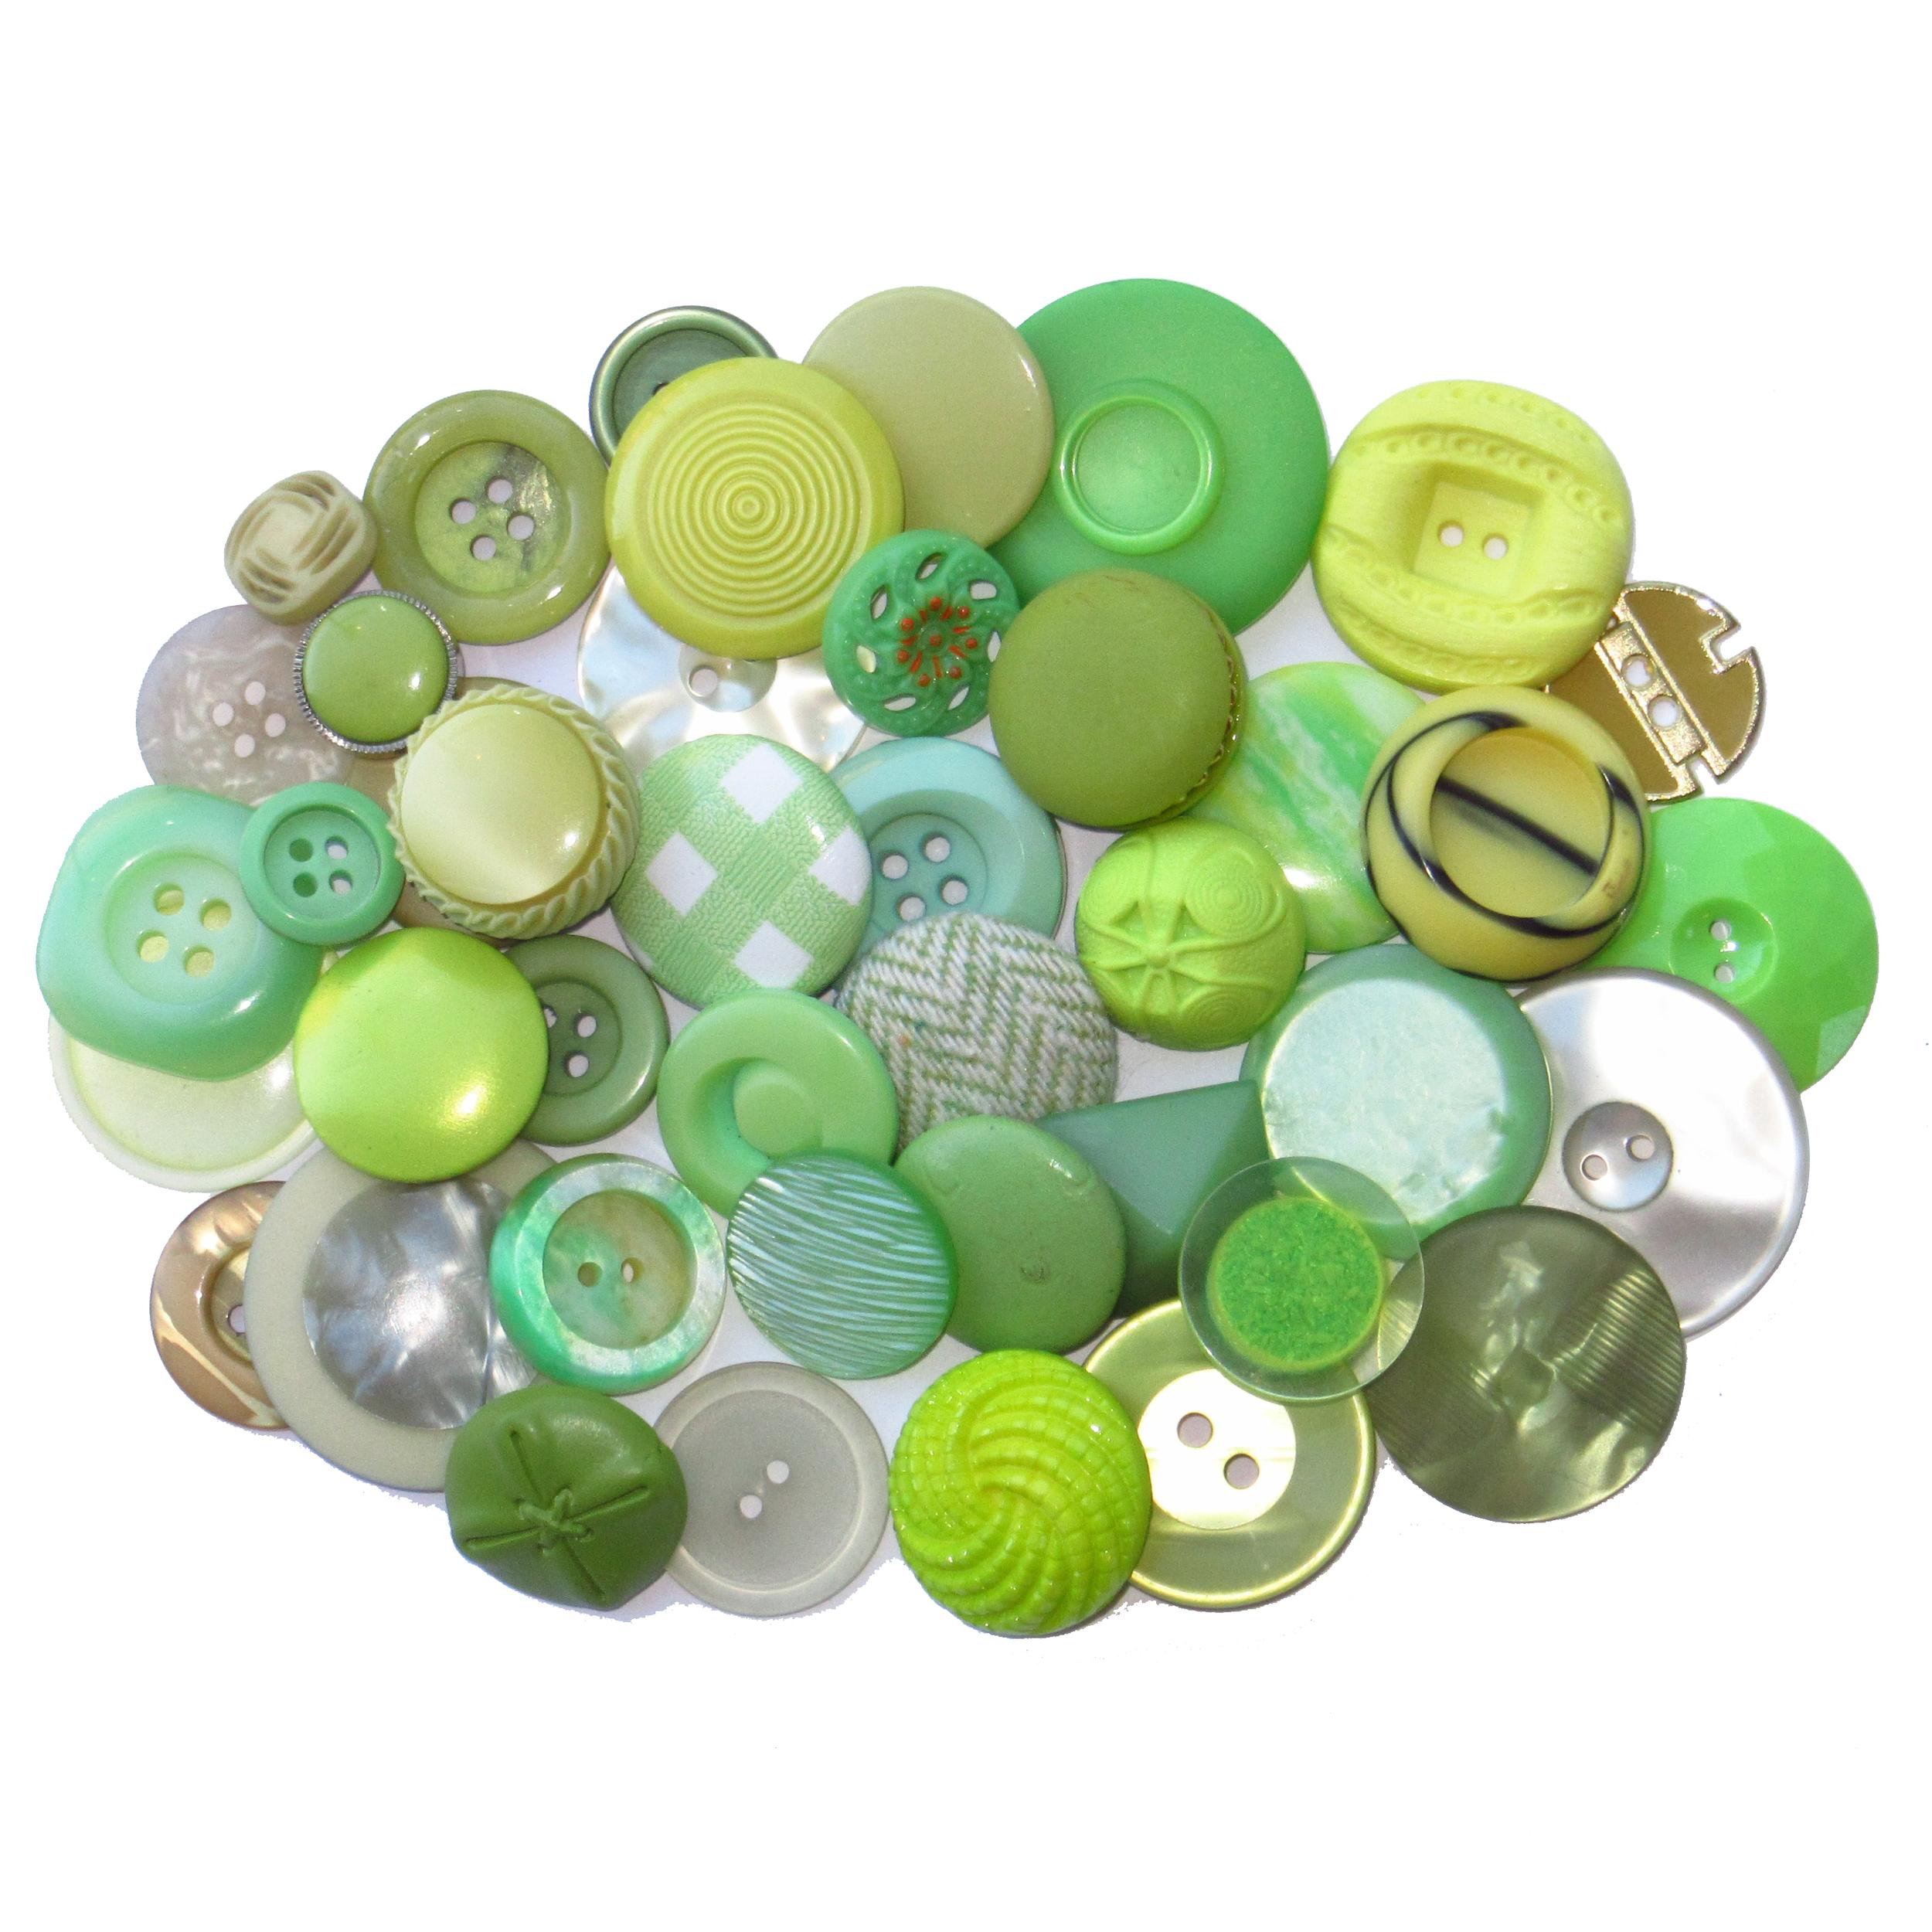 Boutons vert clair